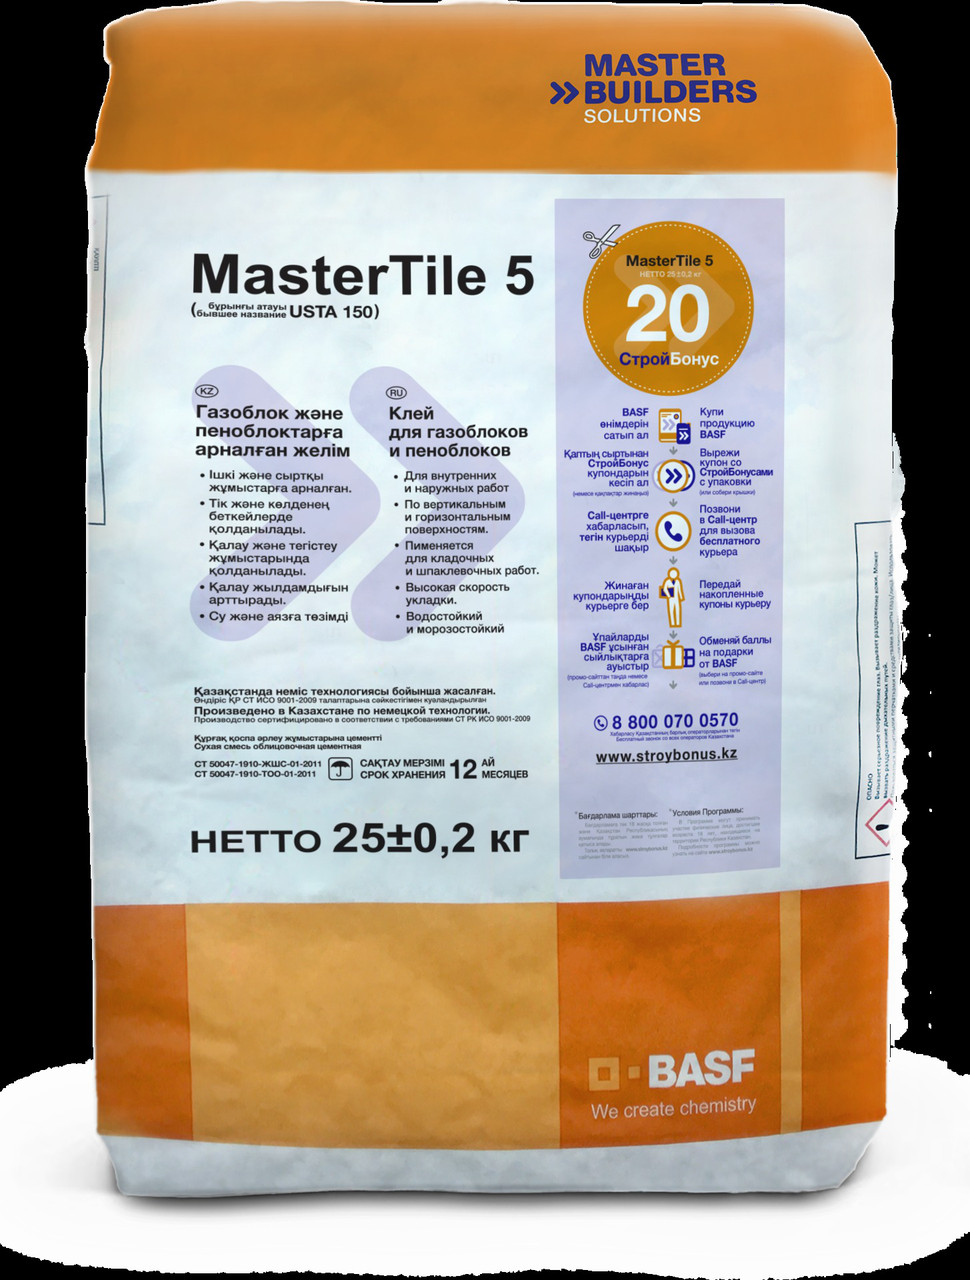 Клеящий раствор для керамики MasterTile DF 560 NT (MasterTile 560 NT) White